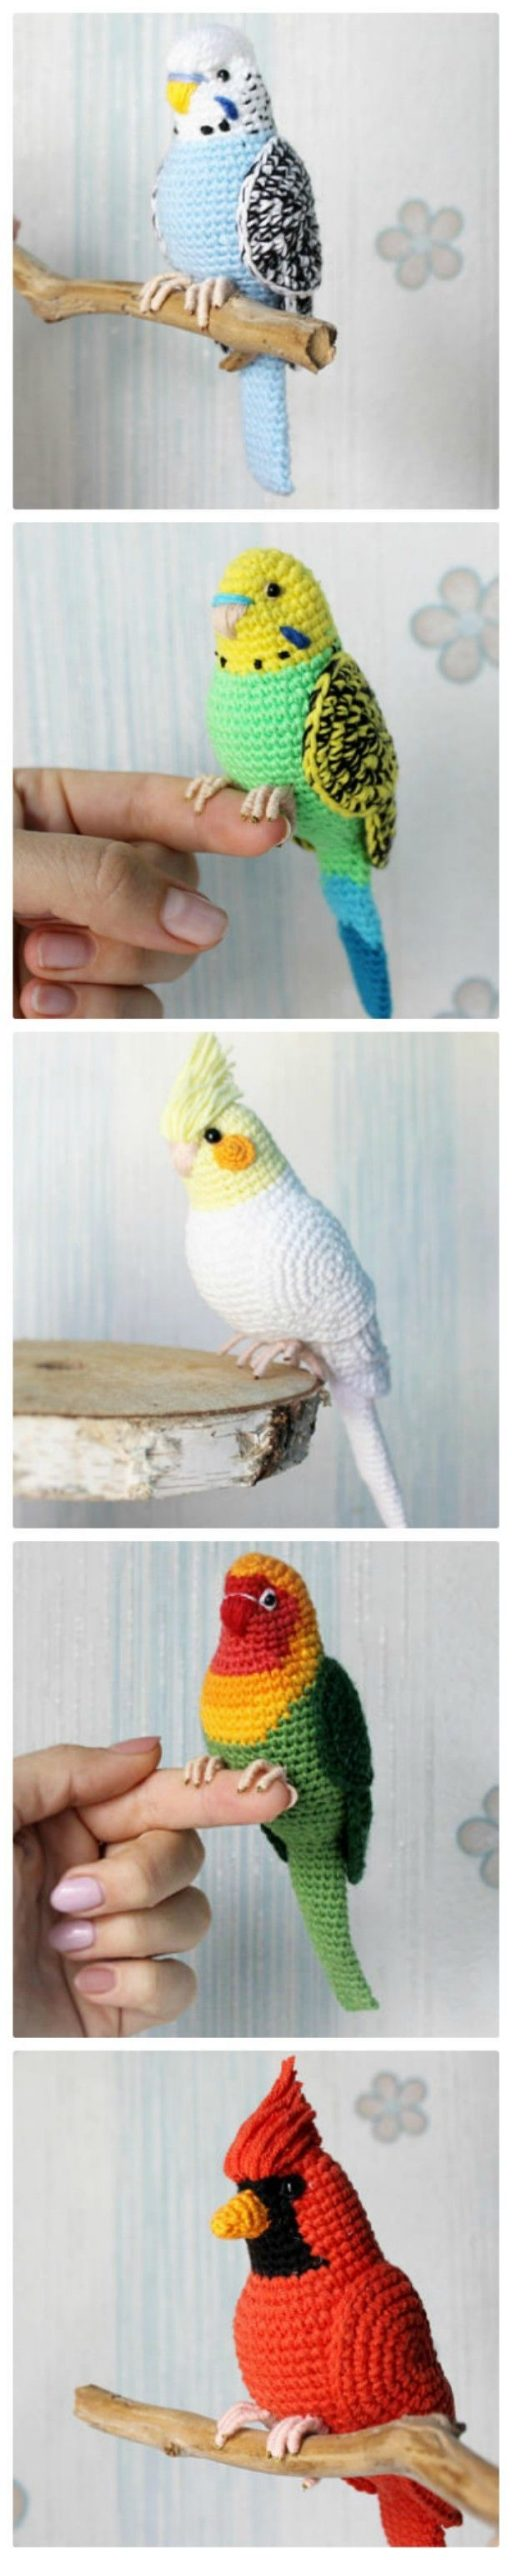 Crochet Bird Patterns Easy DIY Video | The WHOot